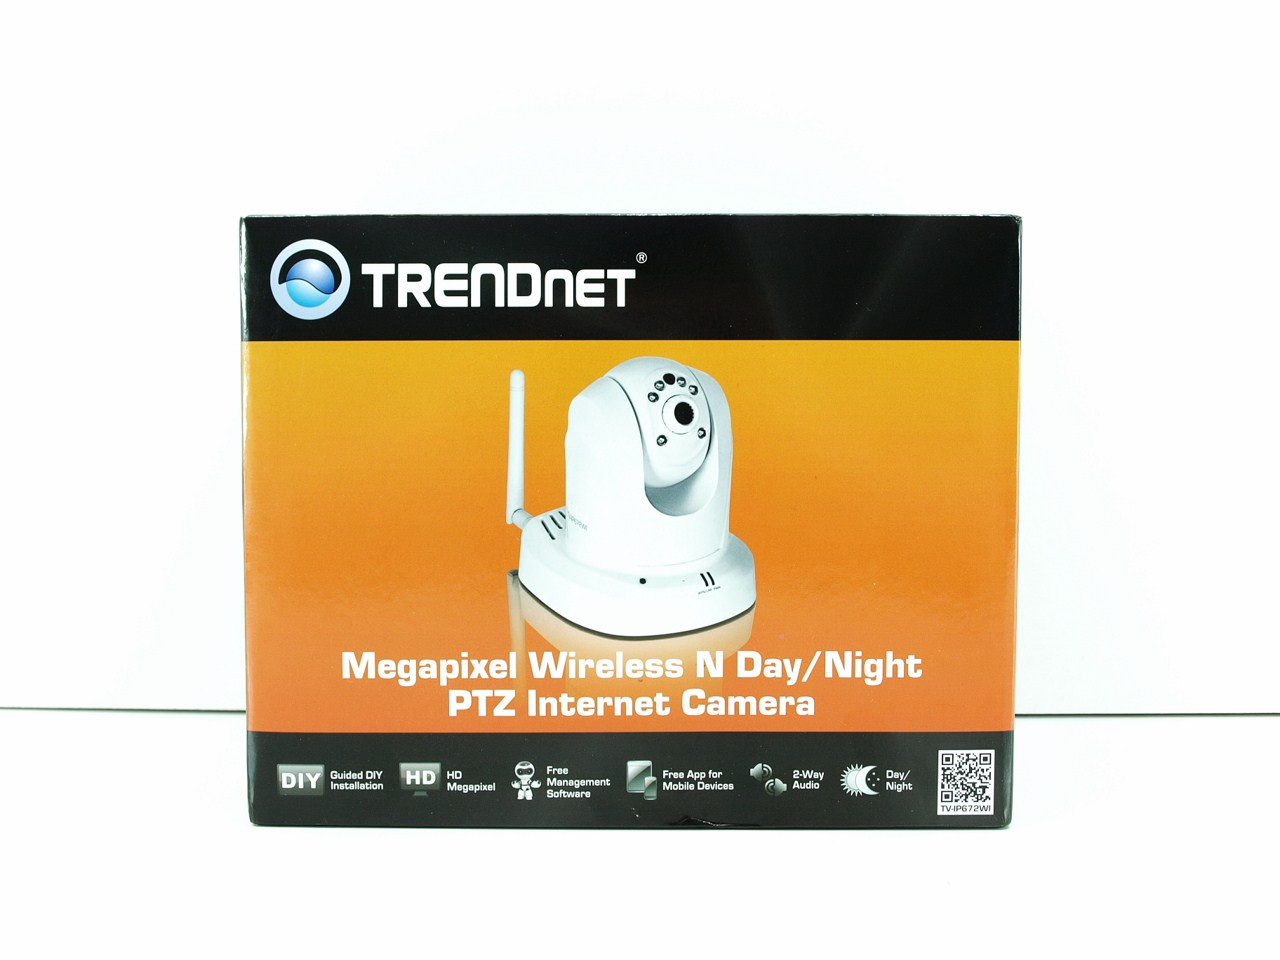 TRENDnet TV-IP672W v1.0R Internet Camera 64 BIT